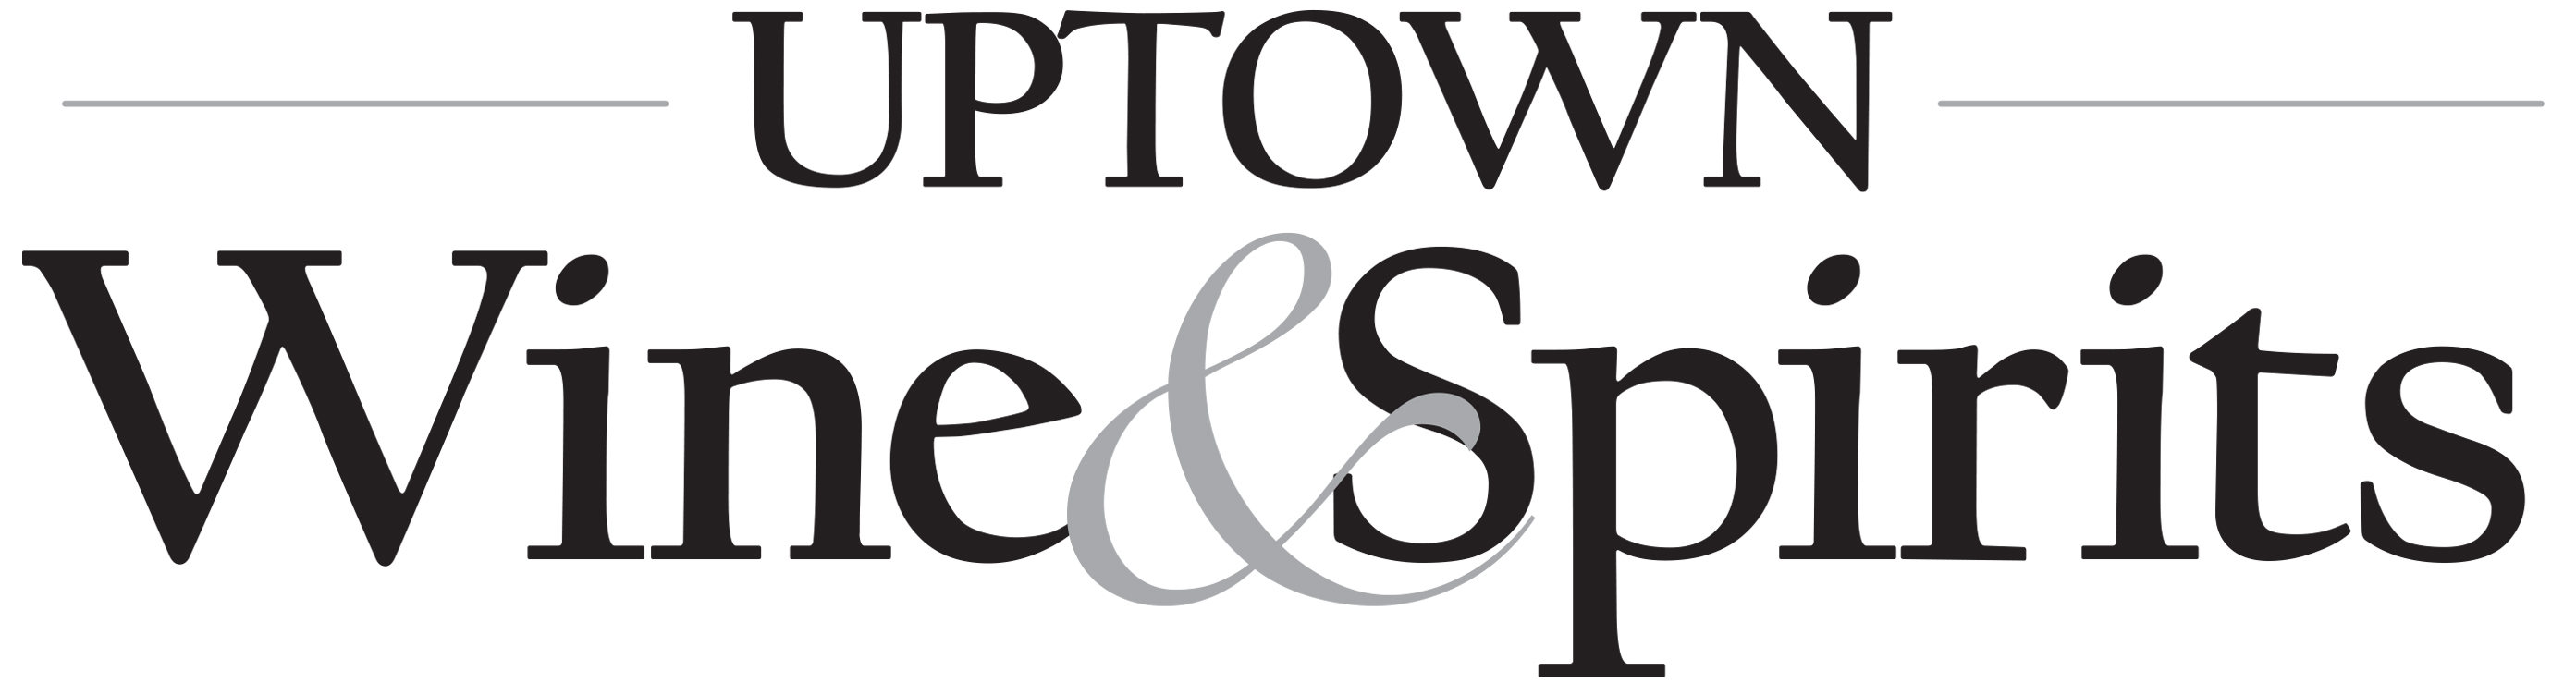 Uptown Wine and Spirits